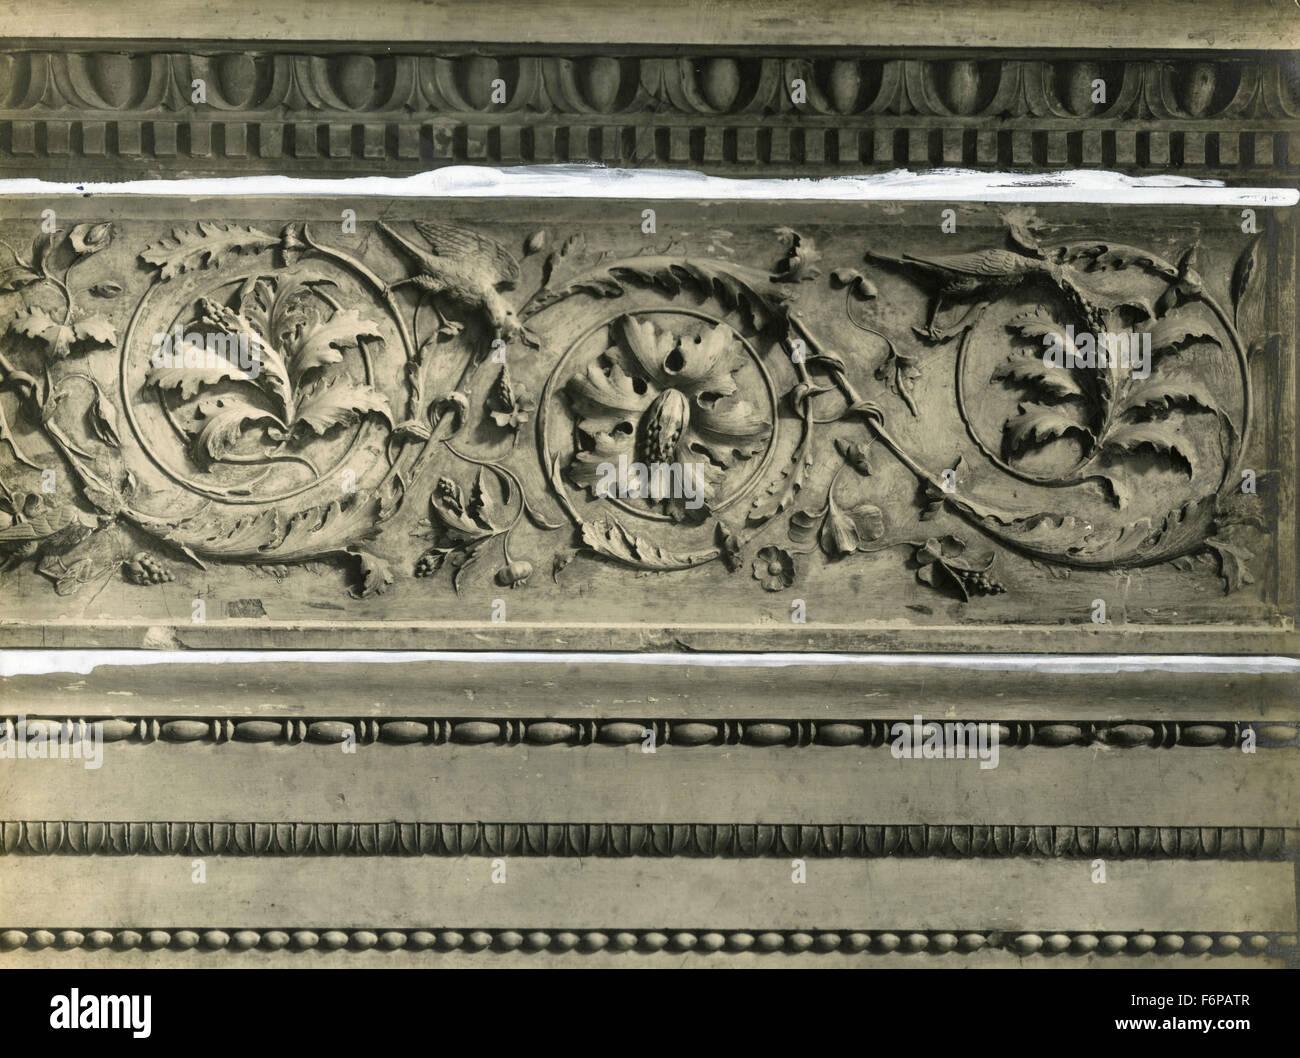 Frieze of a fireplace, Palazzo Ducale, Urbino, Italy - Stock Image